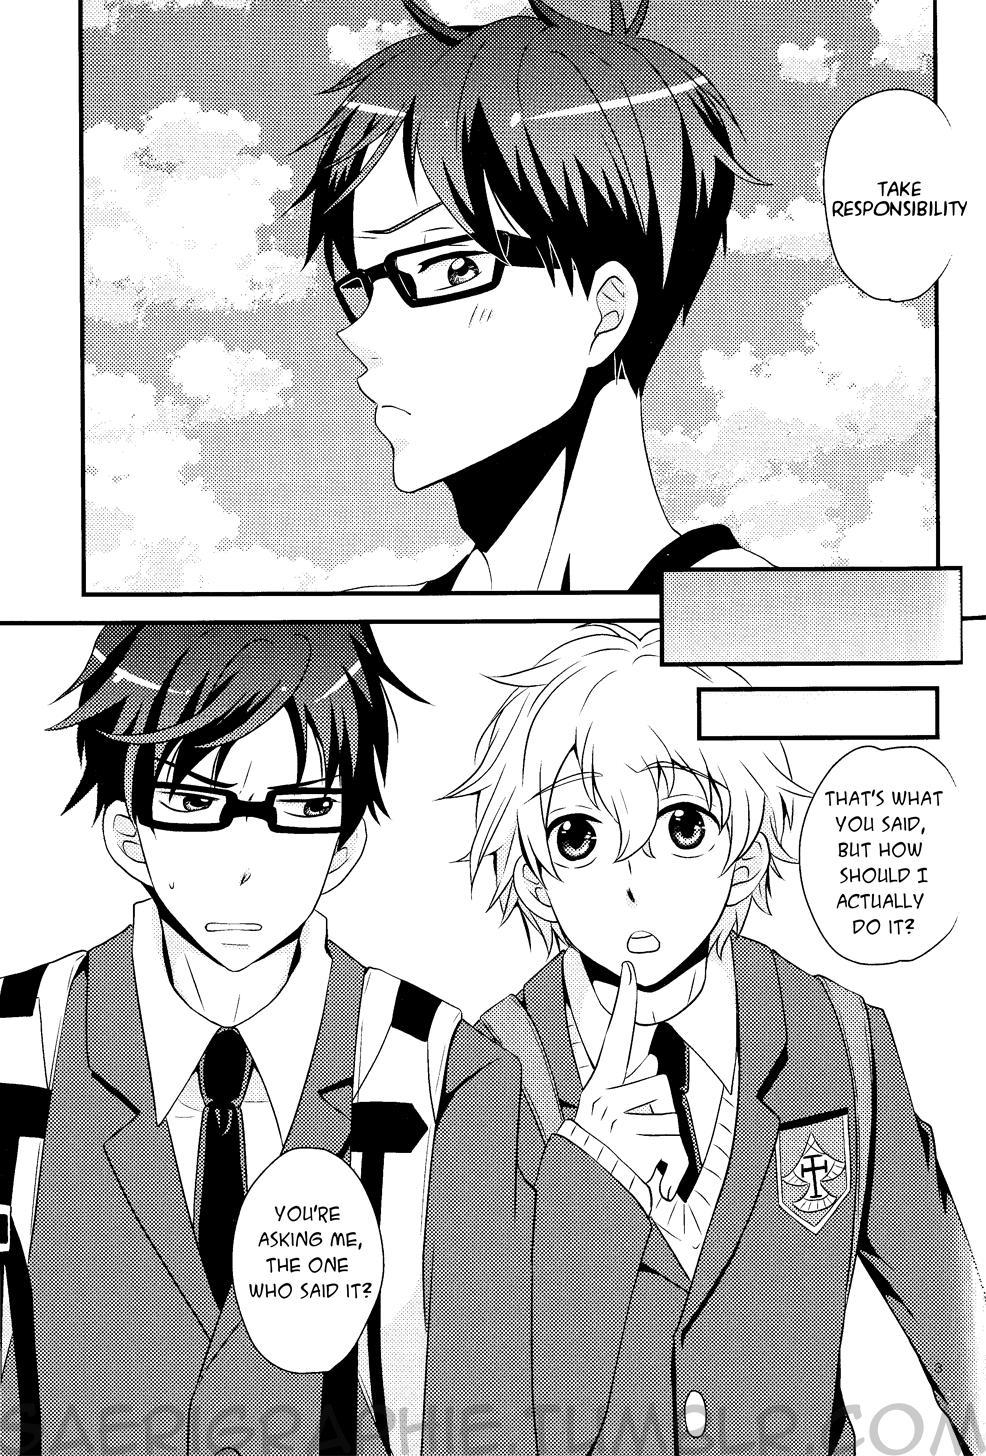 Koibito ga Akogare no Senpai wo Suki Sugite Tsurai | It's Hard When Your Boyfriend Likes an Upperclassman He Admires Too Much 2